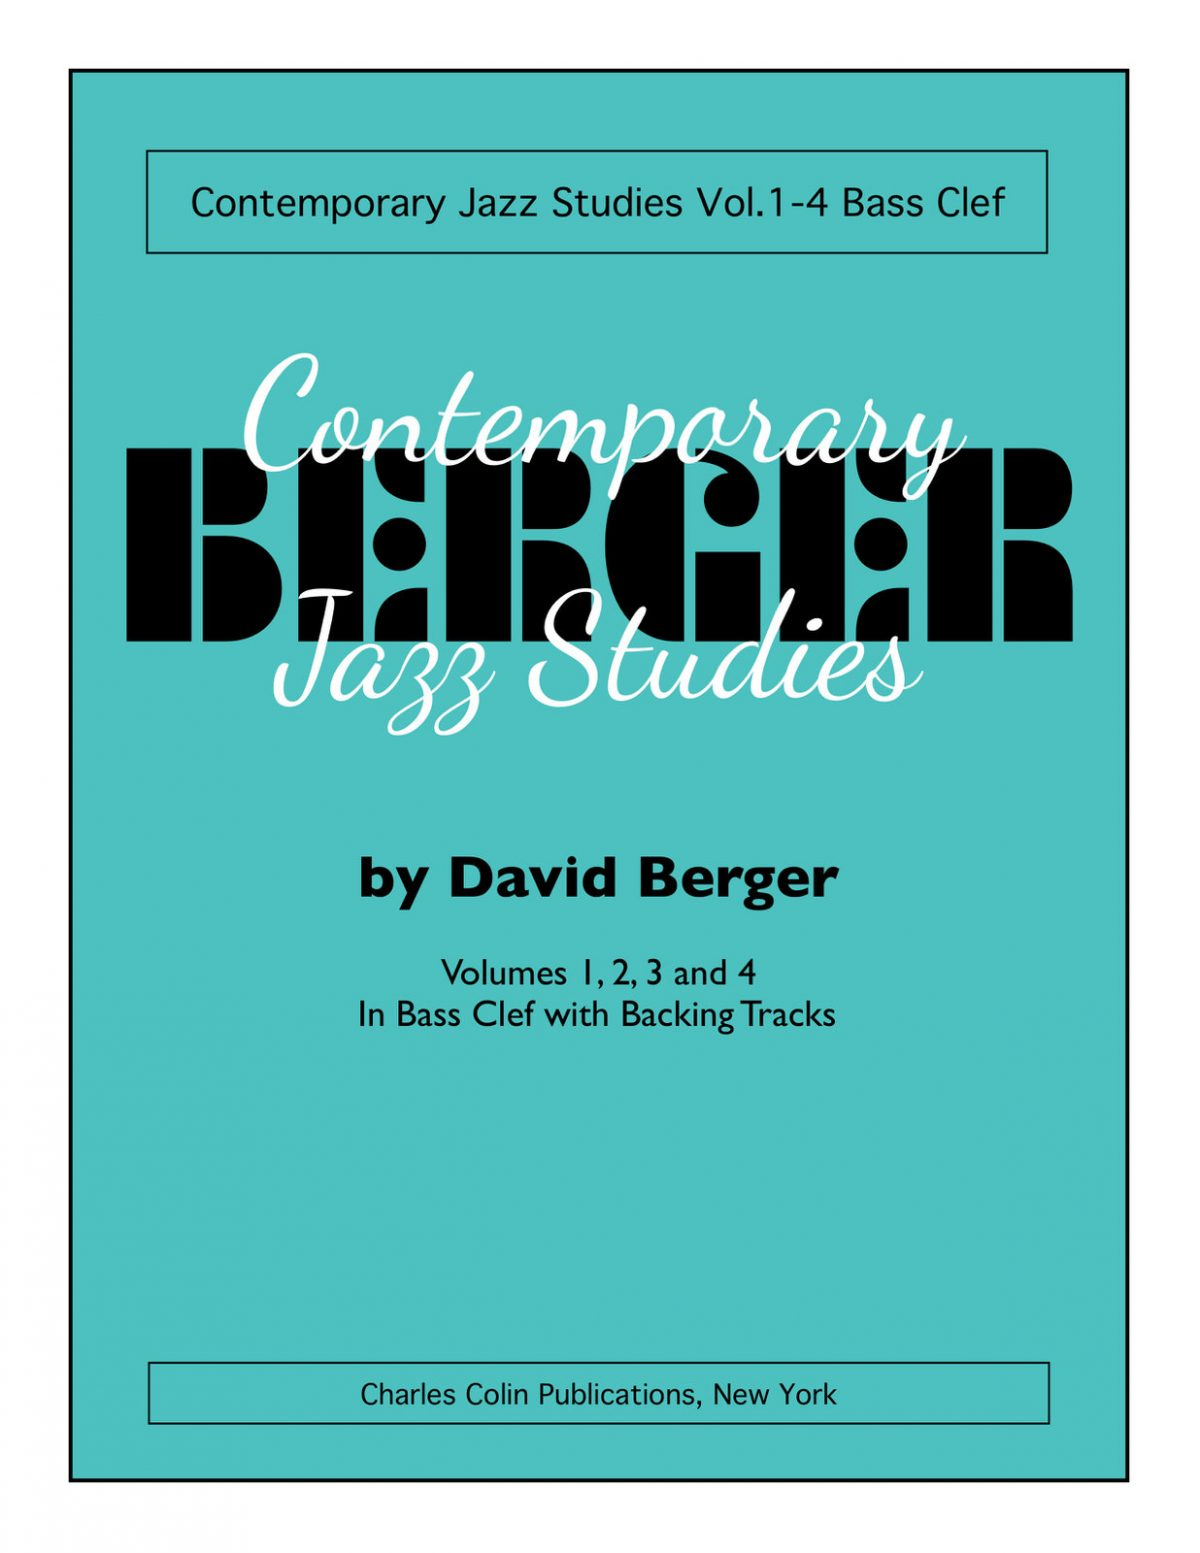 Contemporary Jazz Studies V.1-4 (Bass Clef)